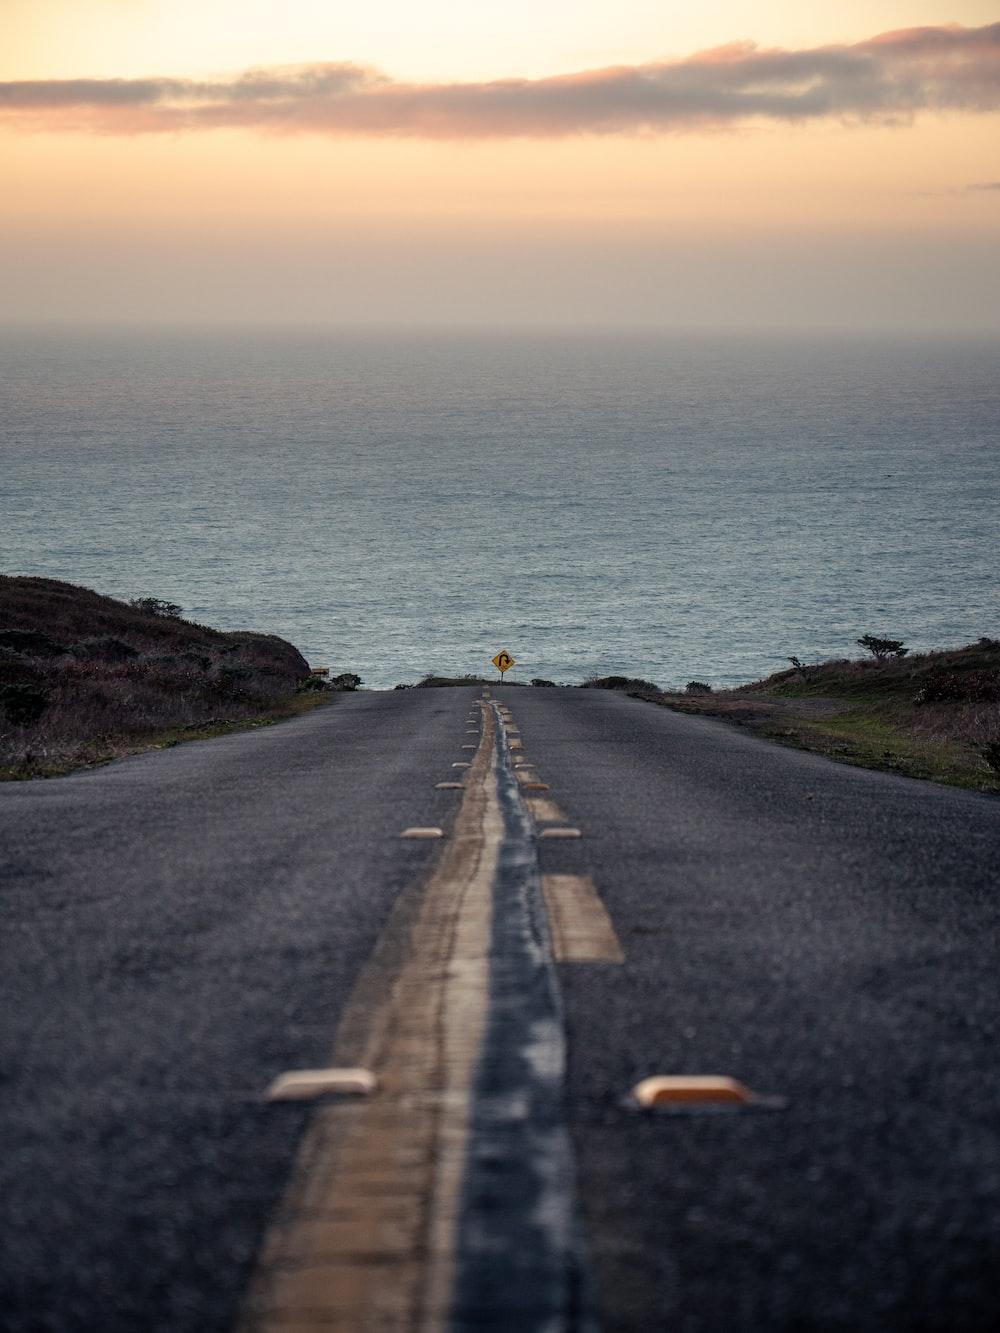 black asphalt road beside body of water during daytime